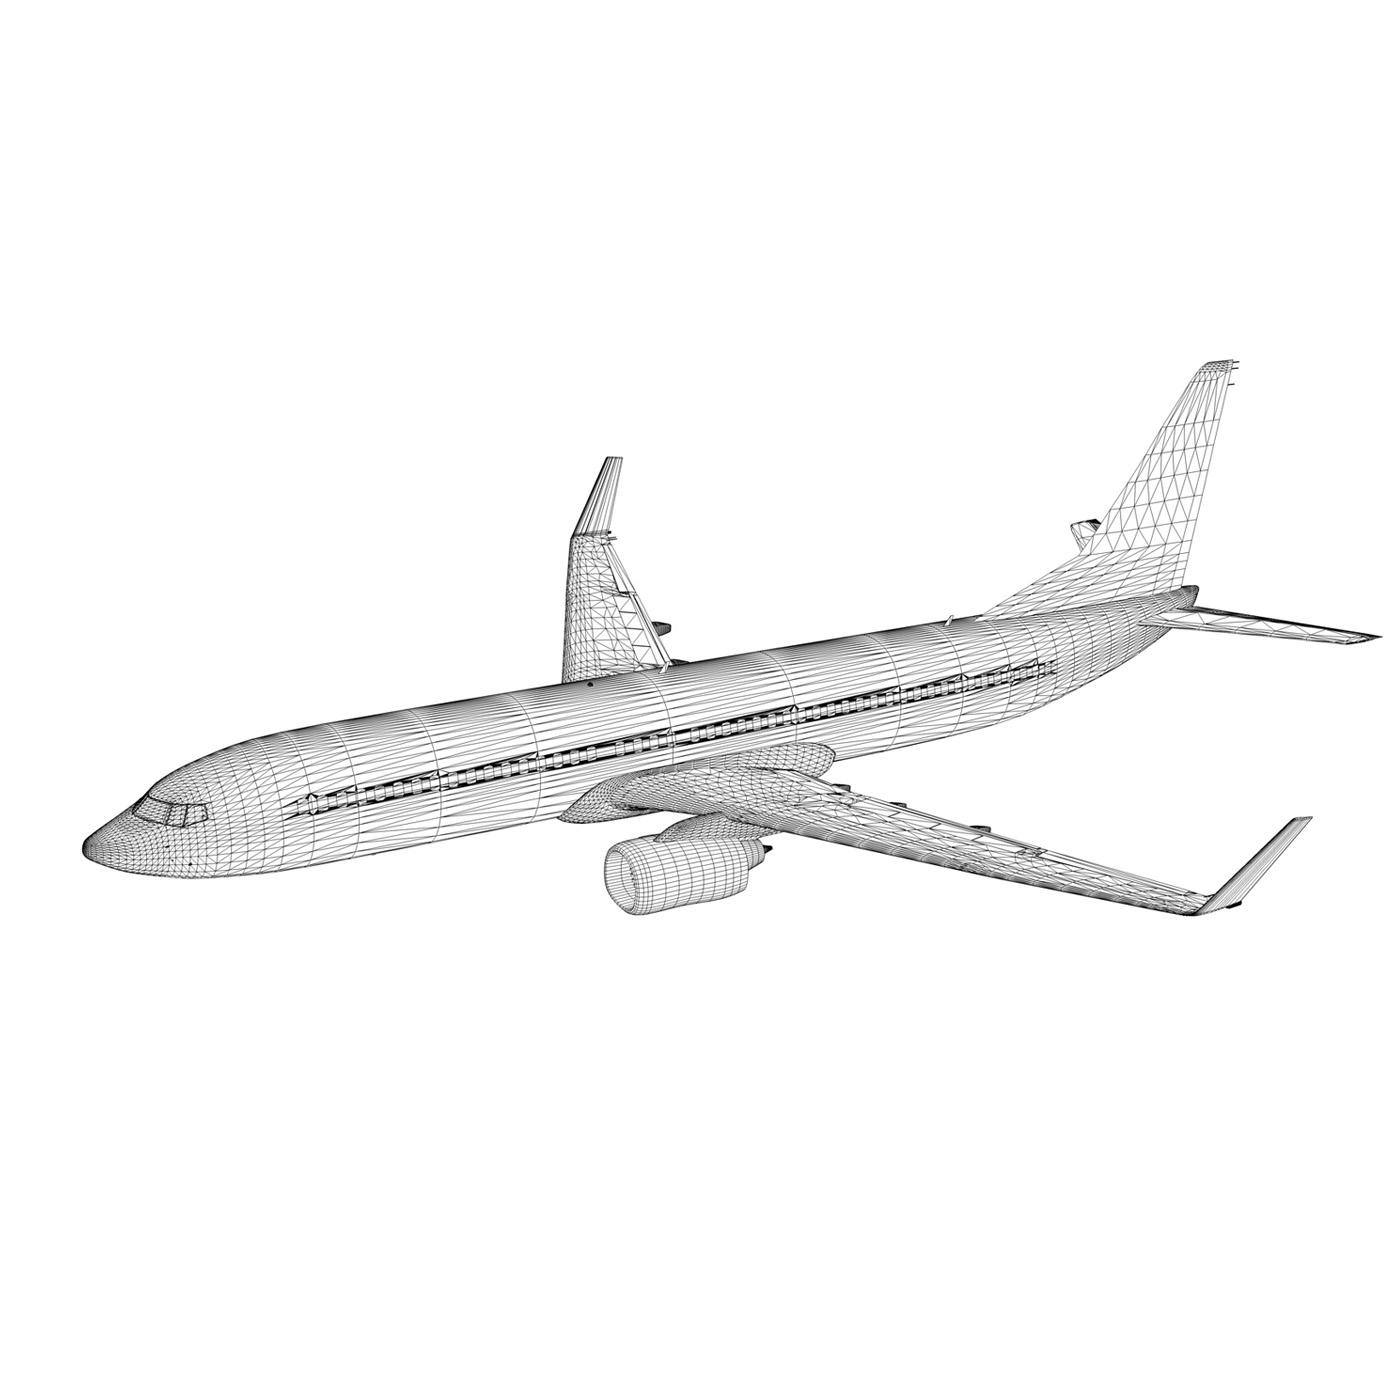 boeing 737-800 goldbair 3d model 3ds fbx c4d lwo obj 293508